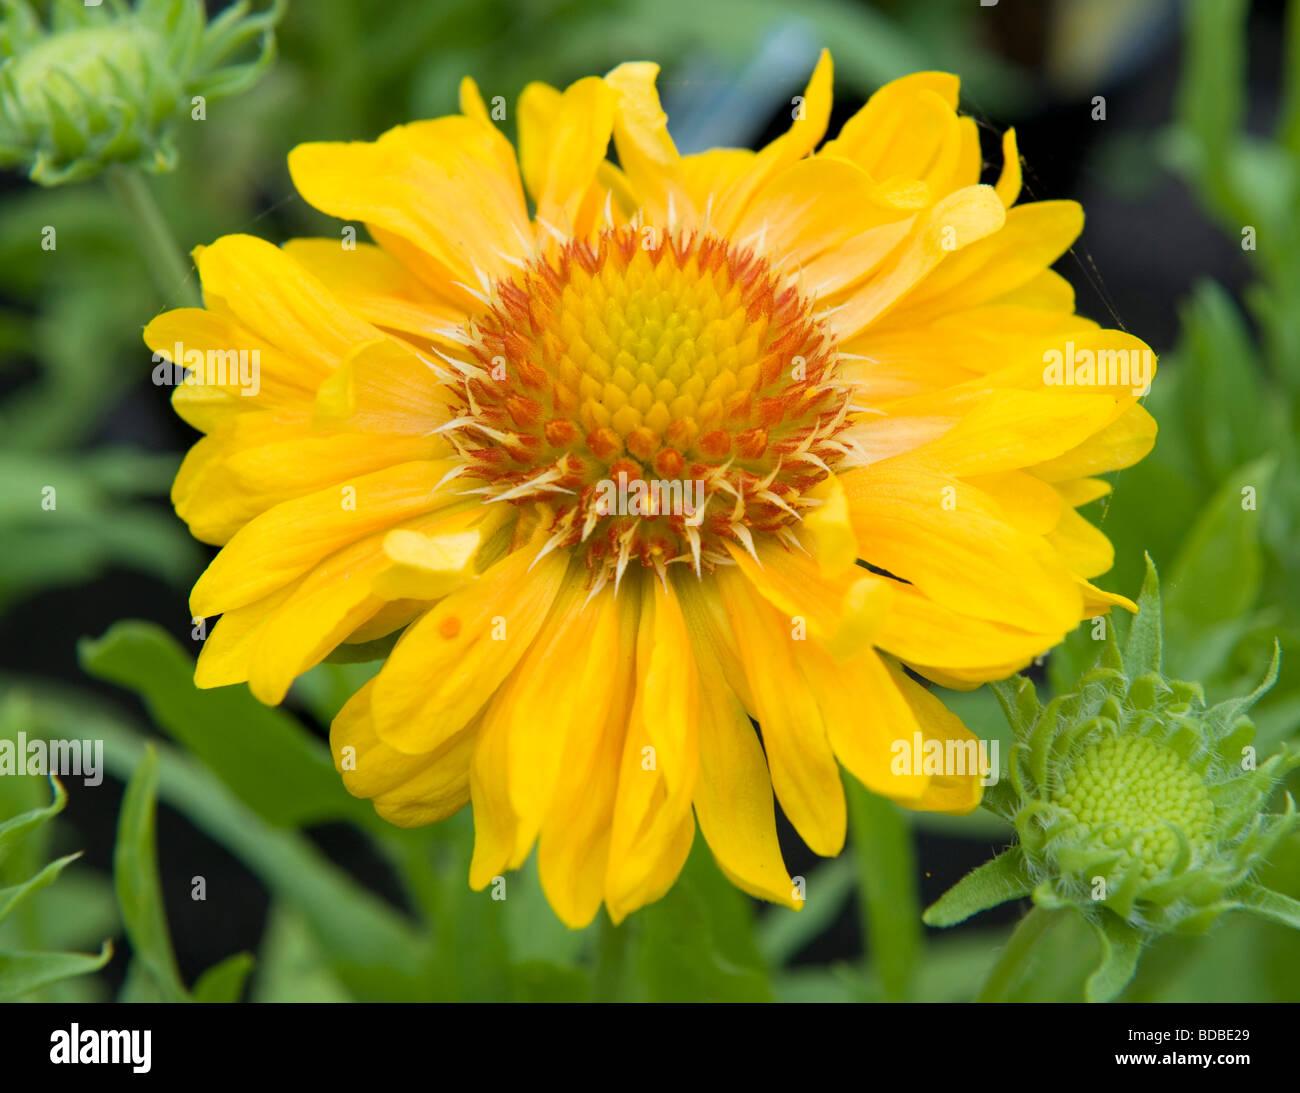 Gaillardia Sunburst Orange A Full Single Bloom Yellow Flower With